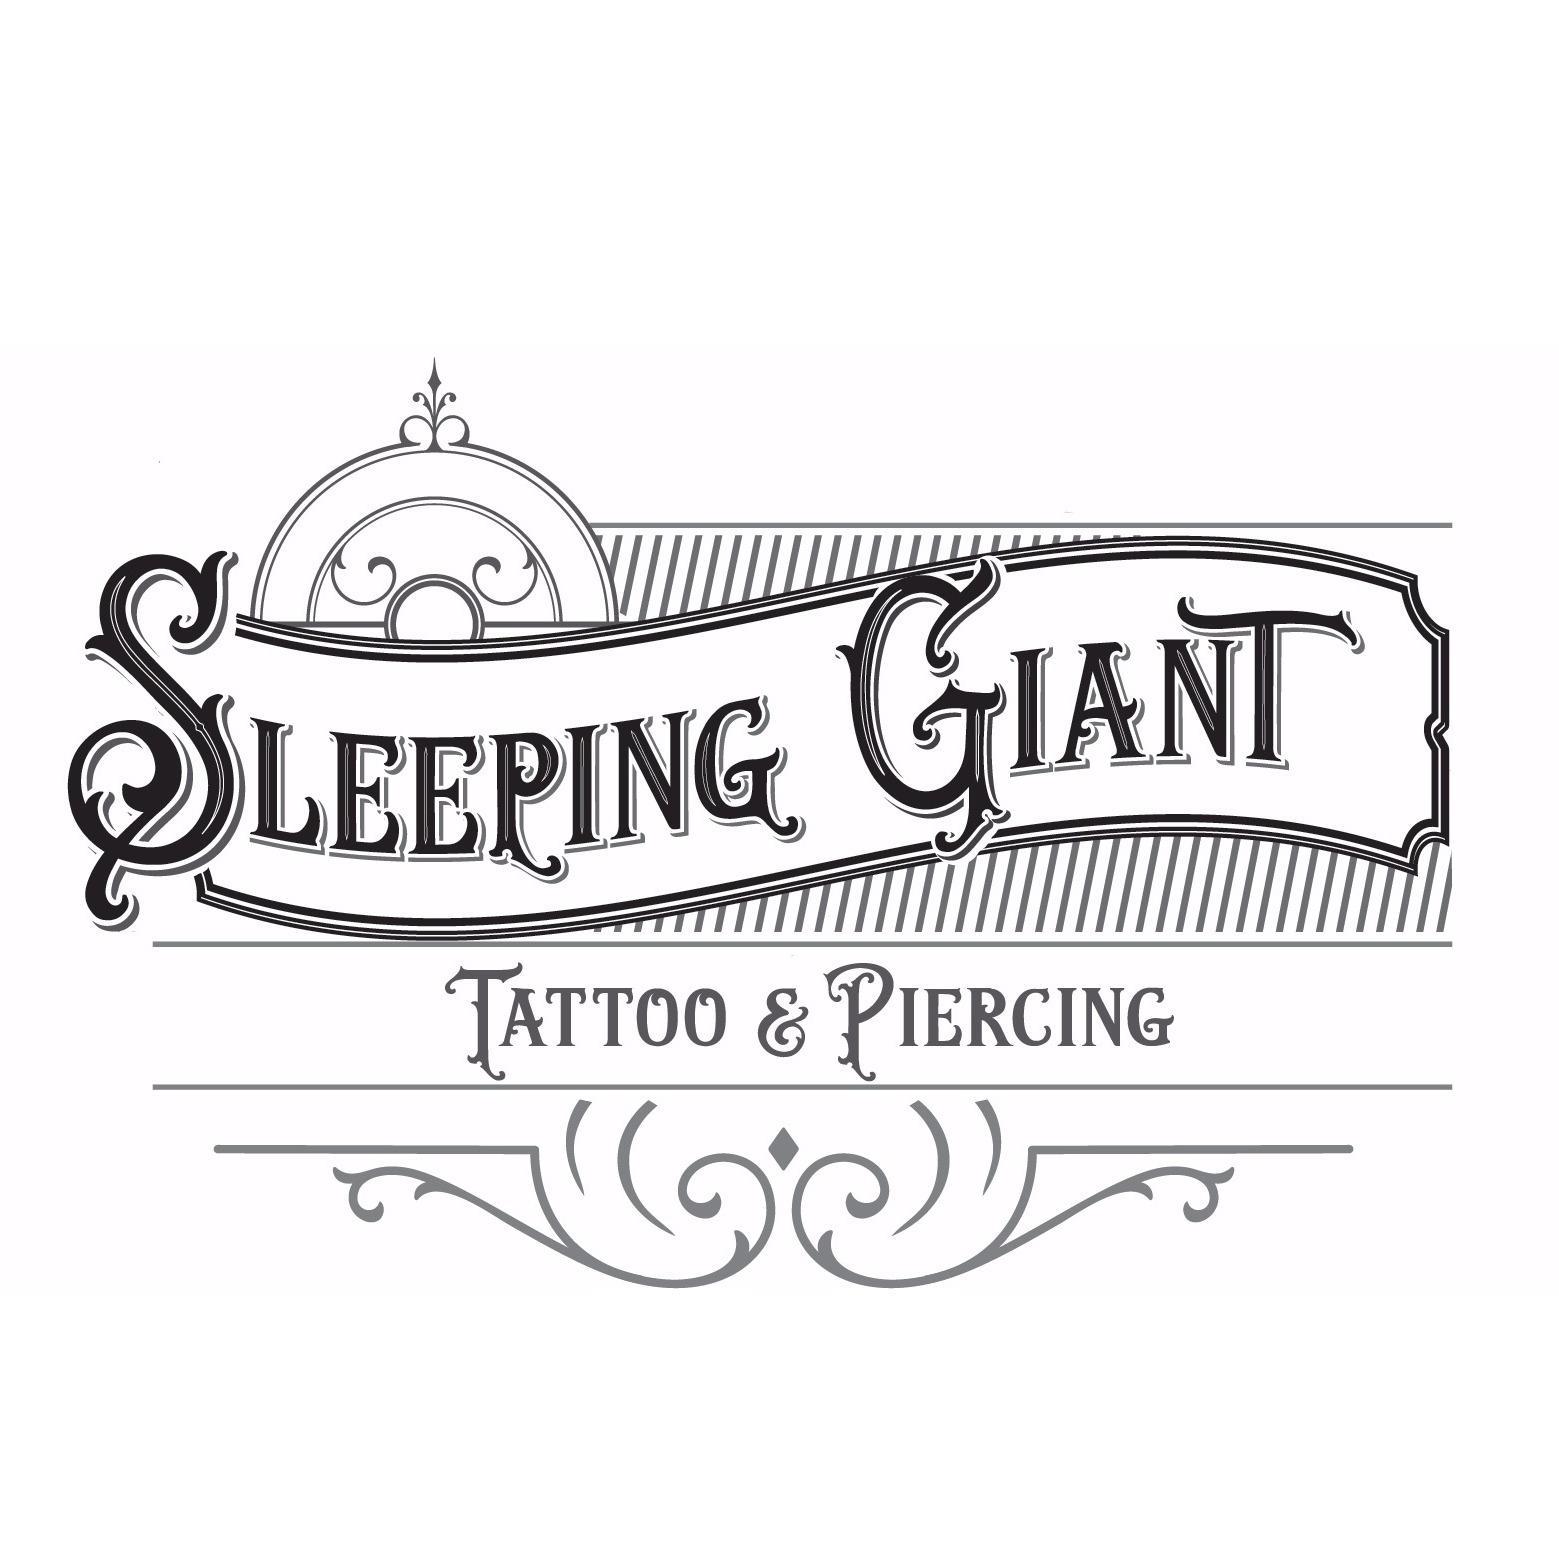 Sleeping Giant Tattoo